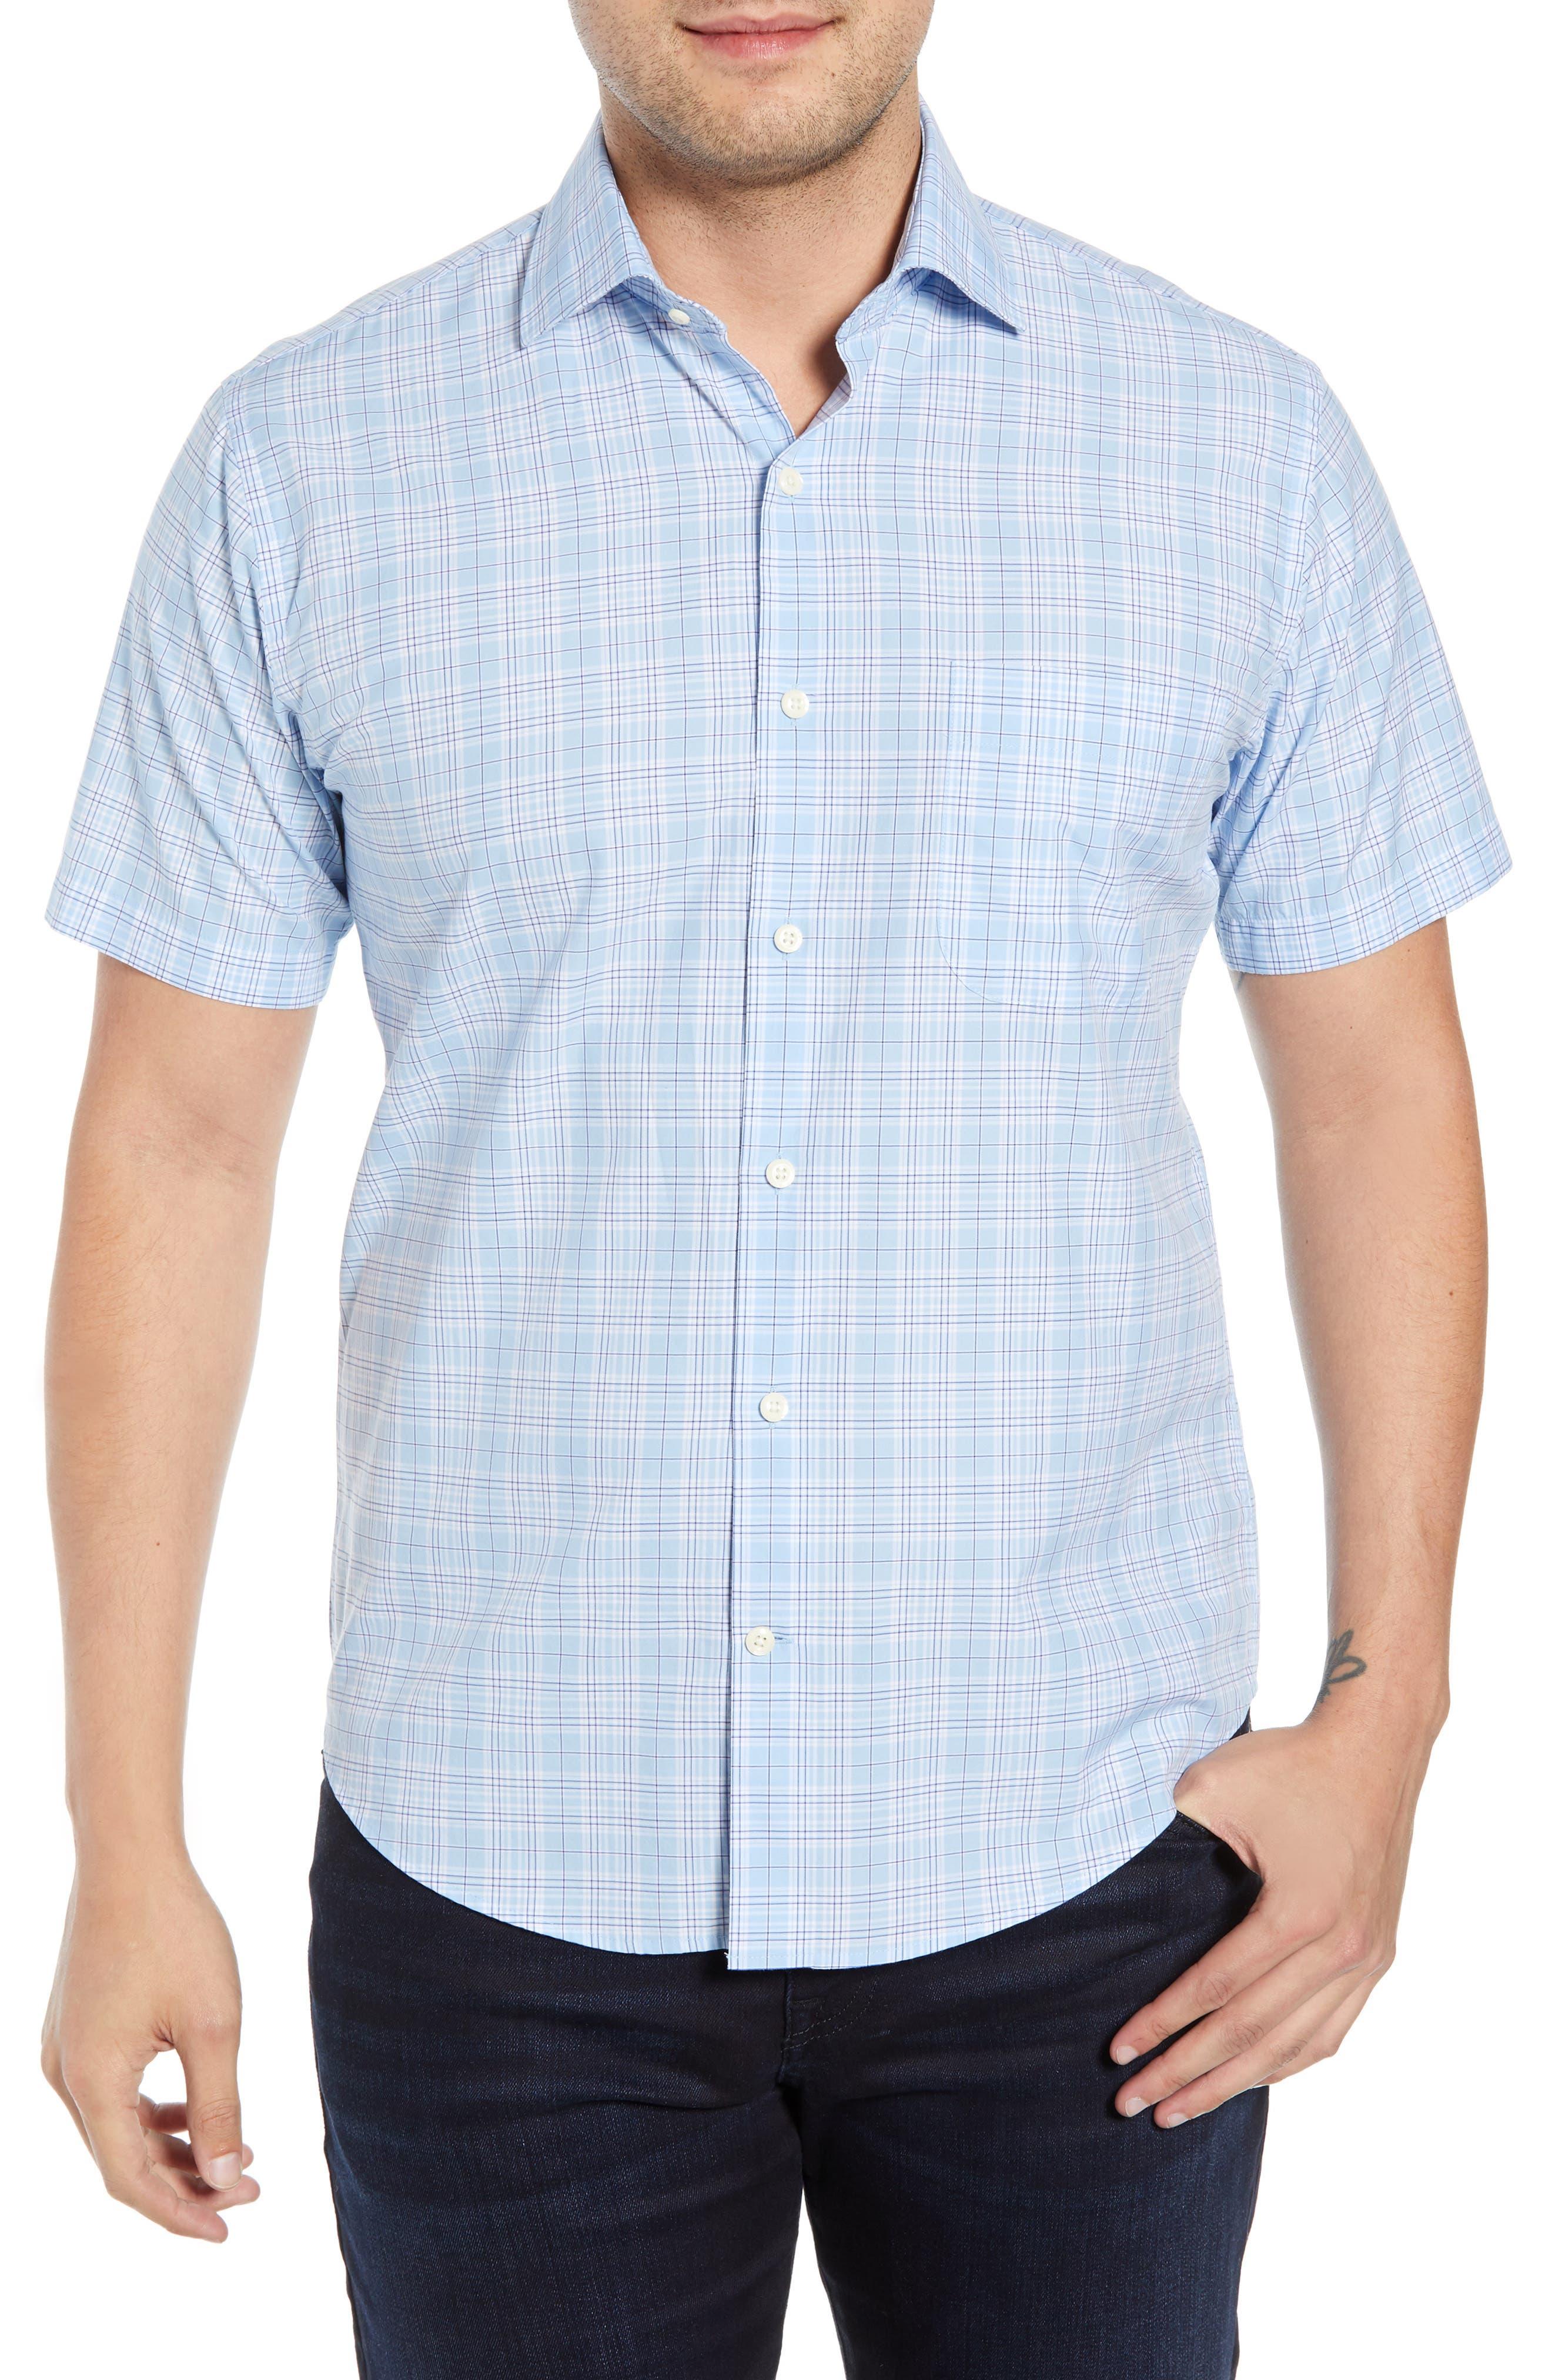 Peter Millar Piedmont Plaid Cotton Sport Shirt, Blue